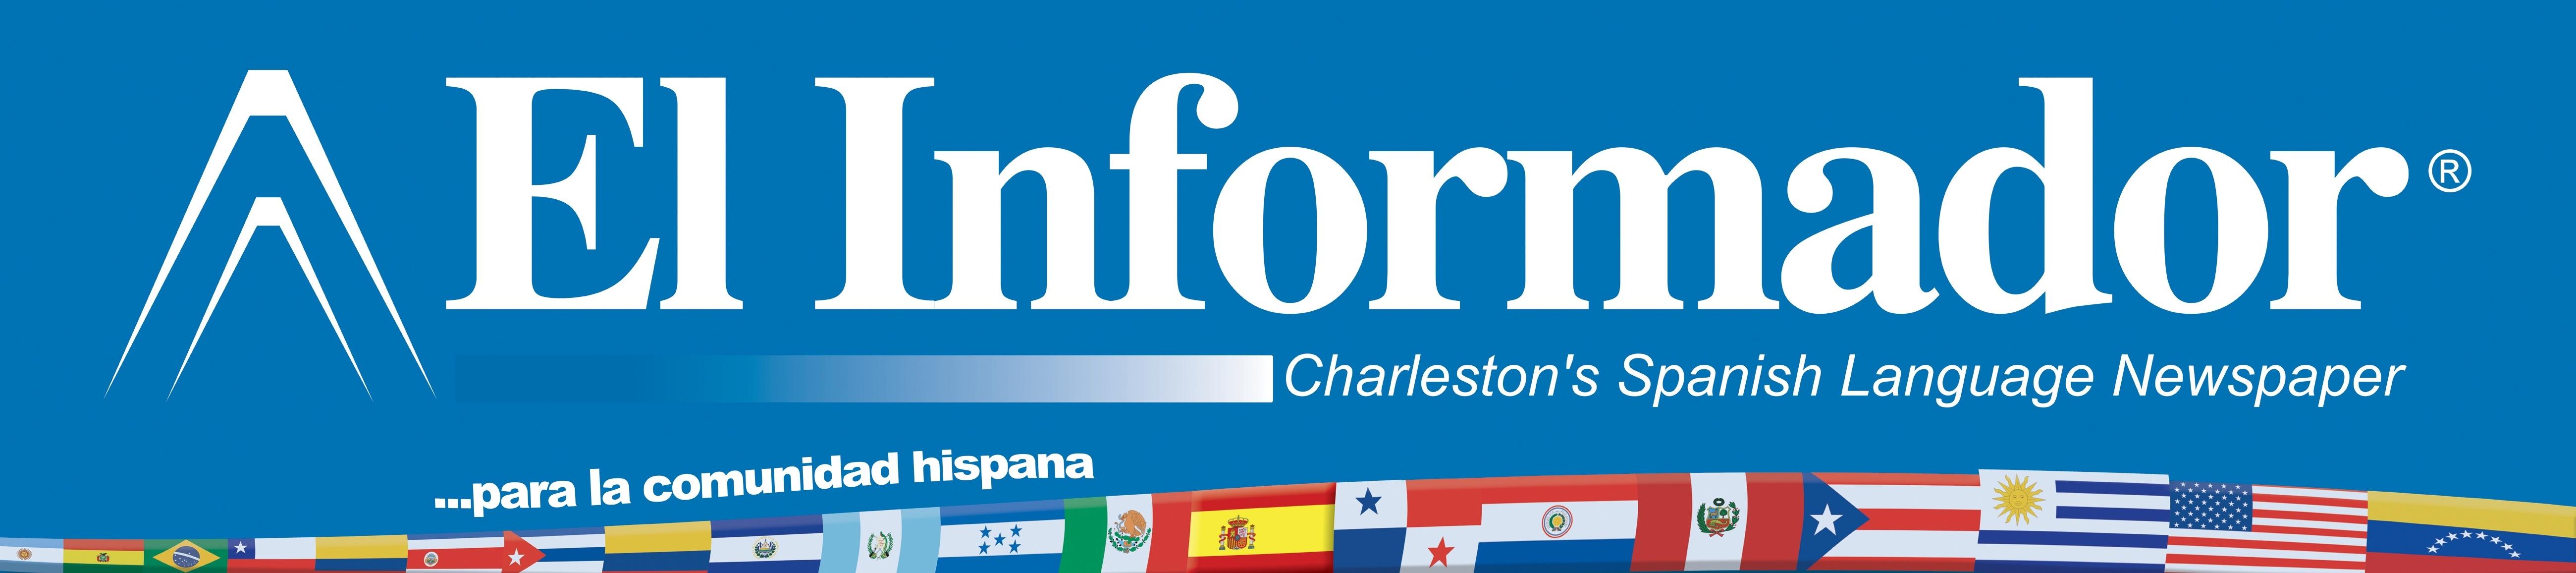 El Informador Newspaper image 1